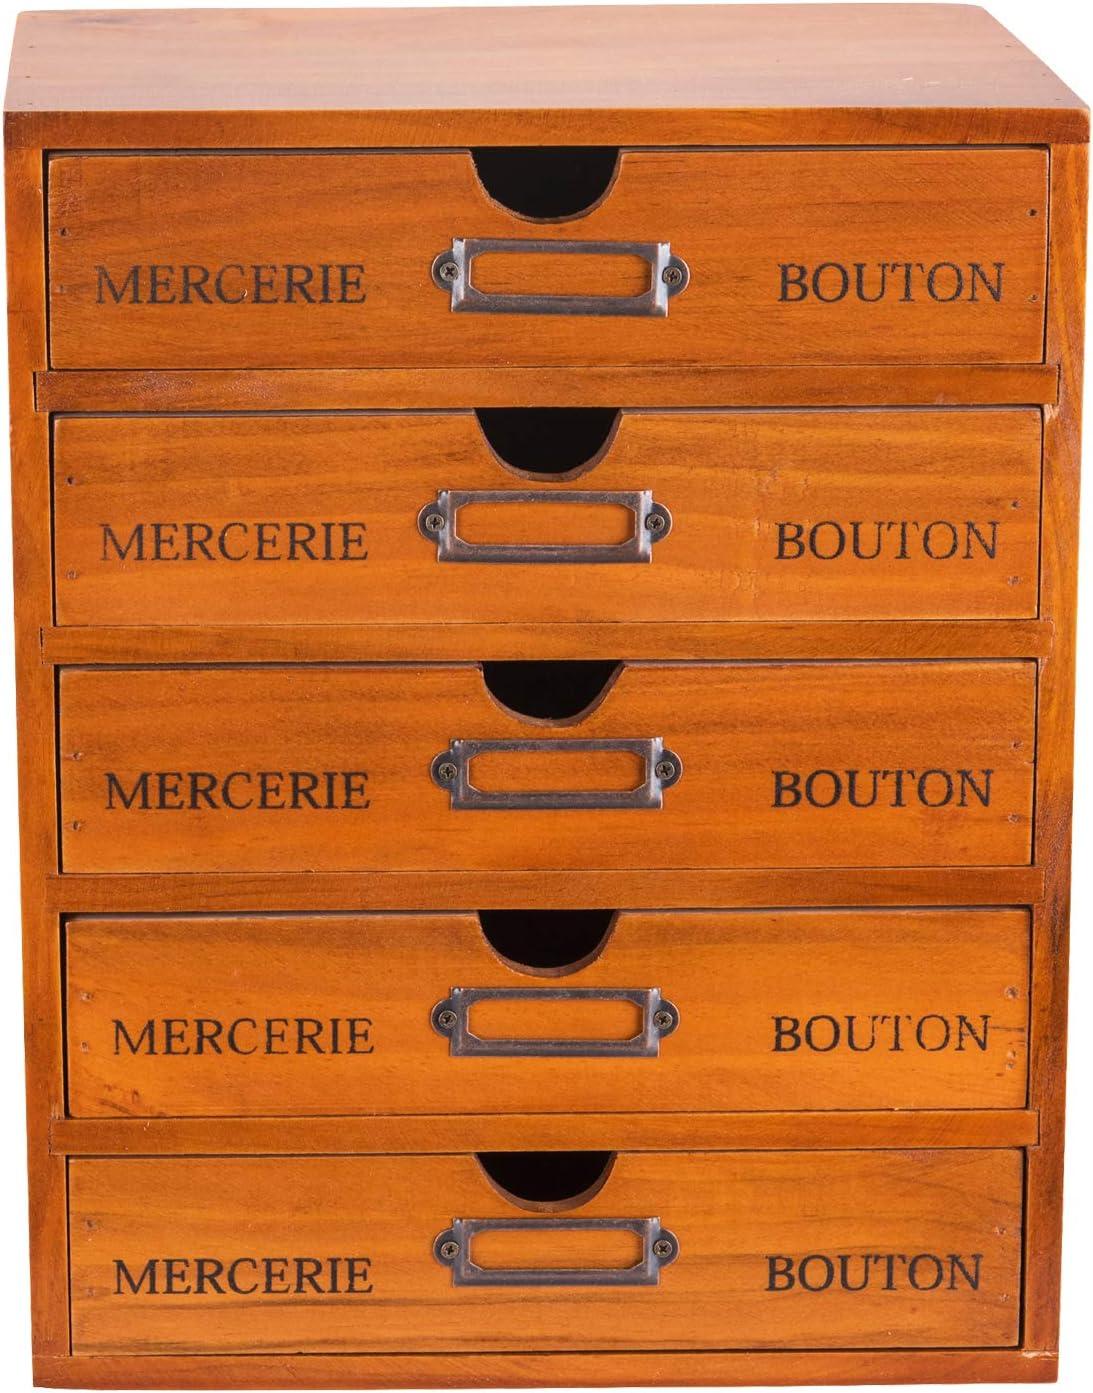 5-Drawer Desk Organizer - Vintage Wooden Storage Box w/ 5 Wide Storage Drawers - Rustic Shelf Drawer - Home Office Desk Organizers and Accessories - Multilevel Wood Table Top Desk Drawer Organizer